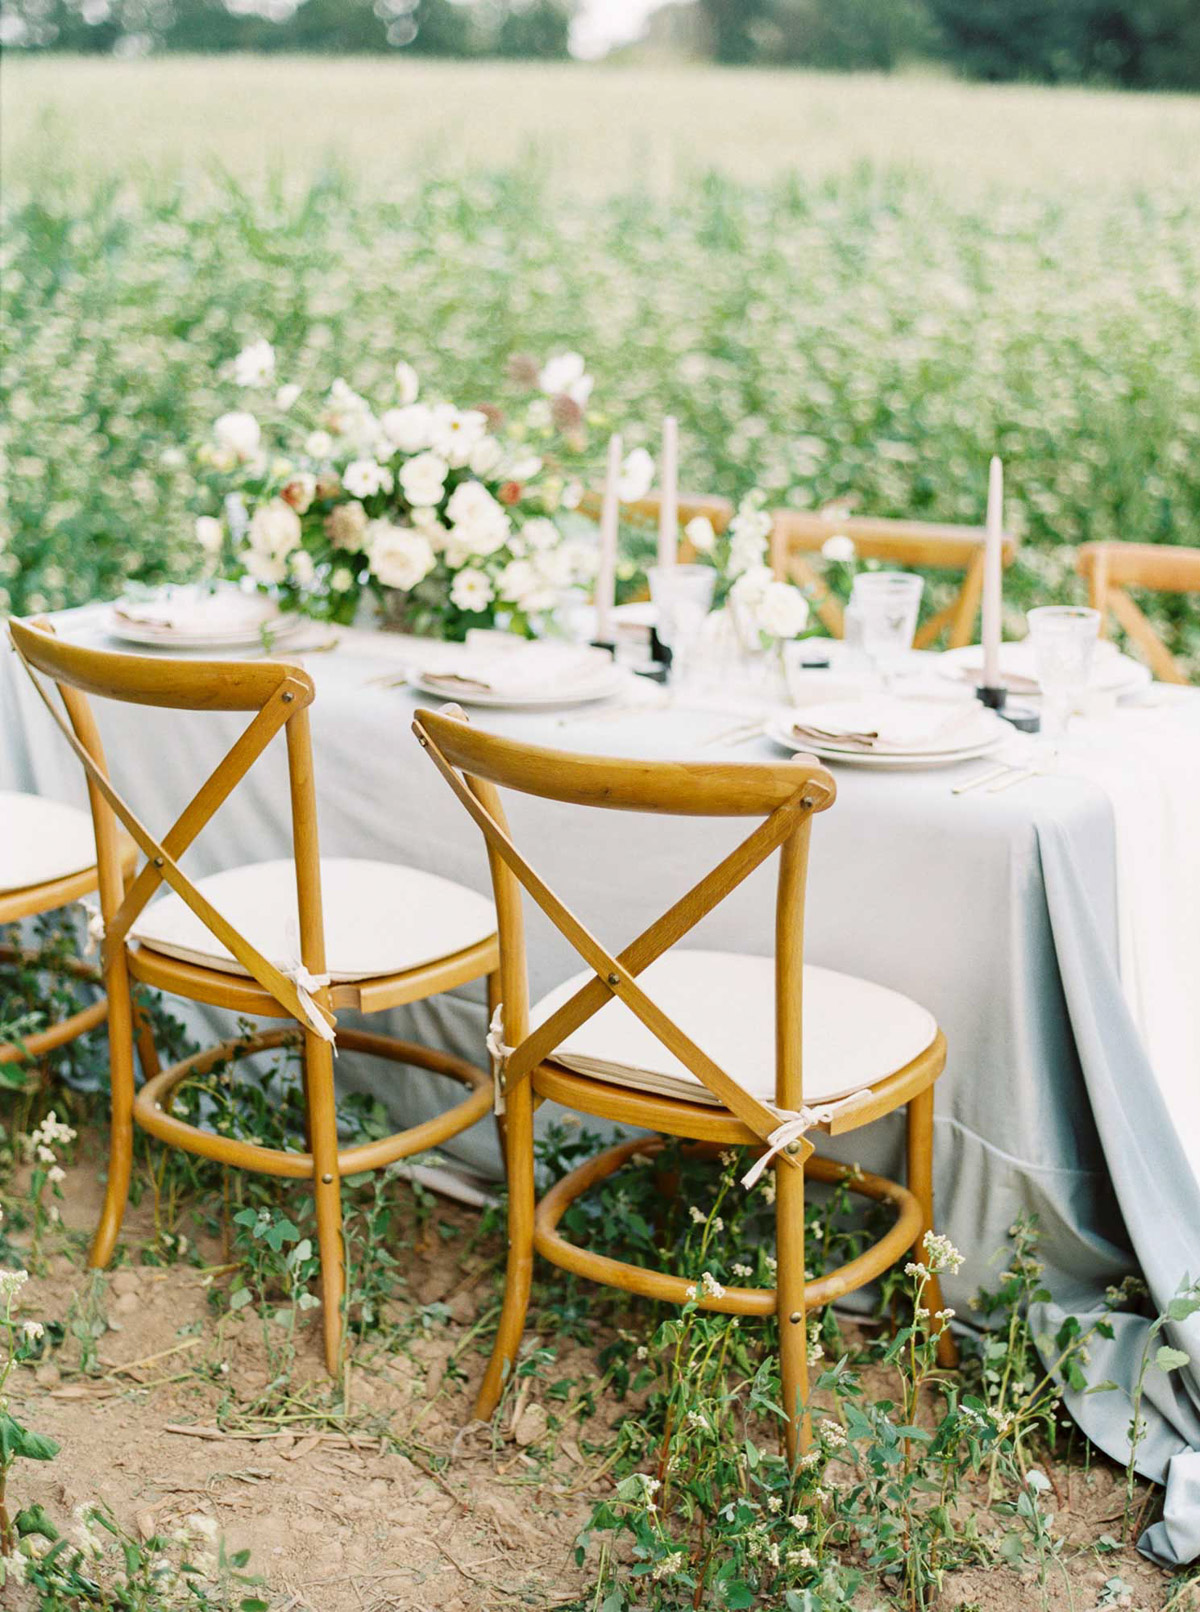 kayla-yestal-vineyard-bride-swish-list-woodland-weddings-niagara-wedding-editorial-60.jpg